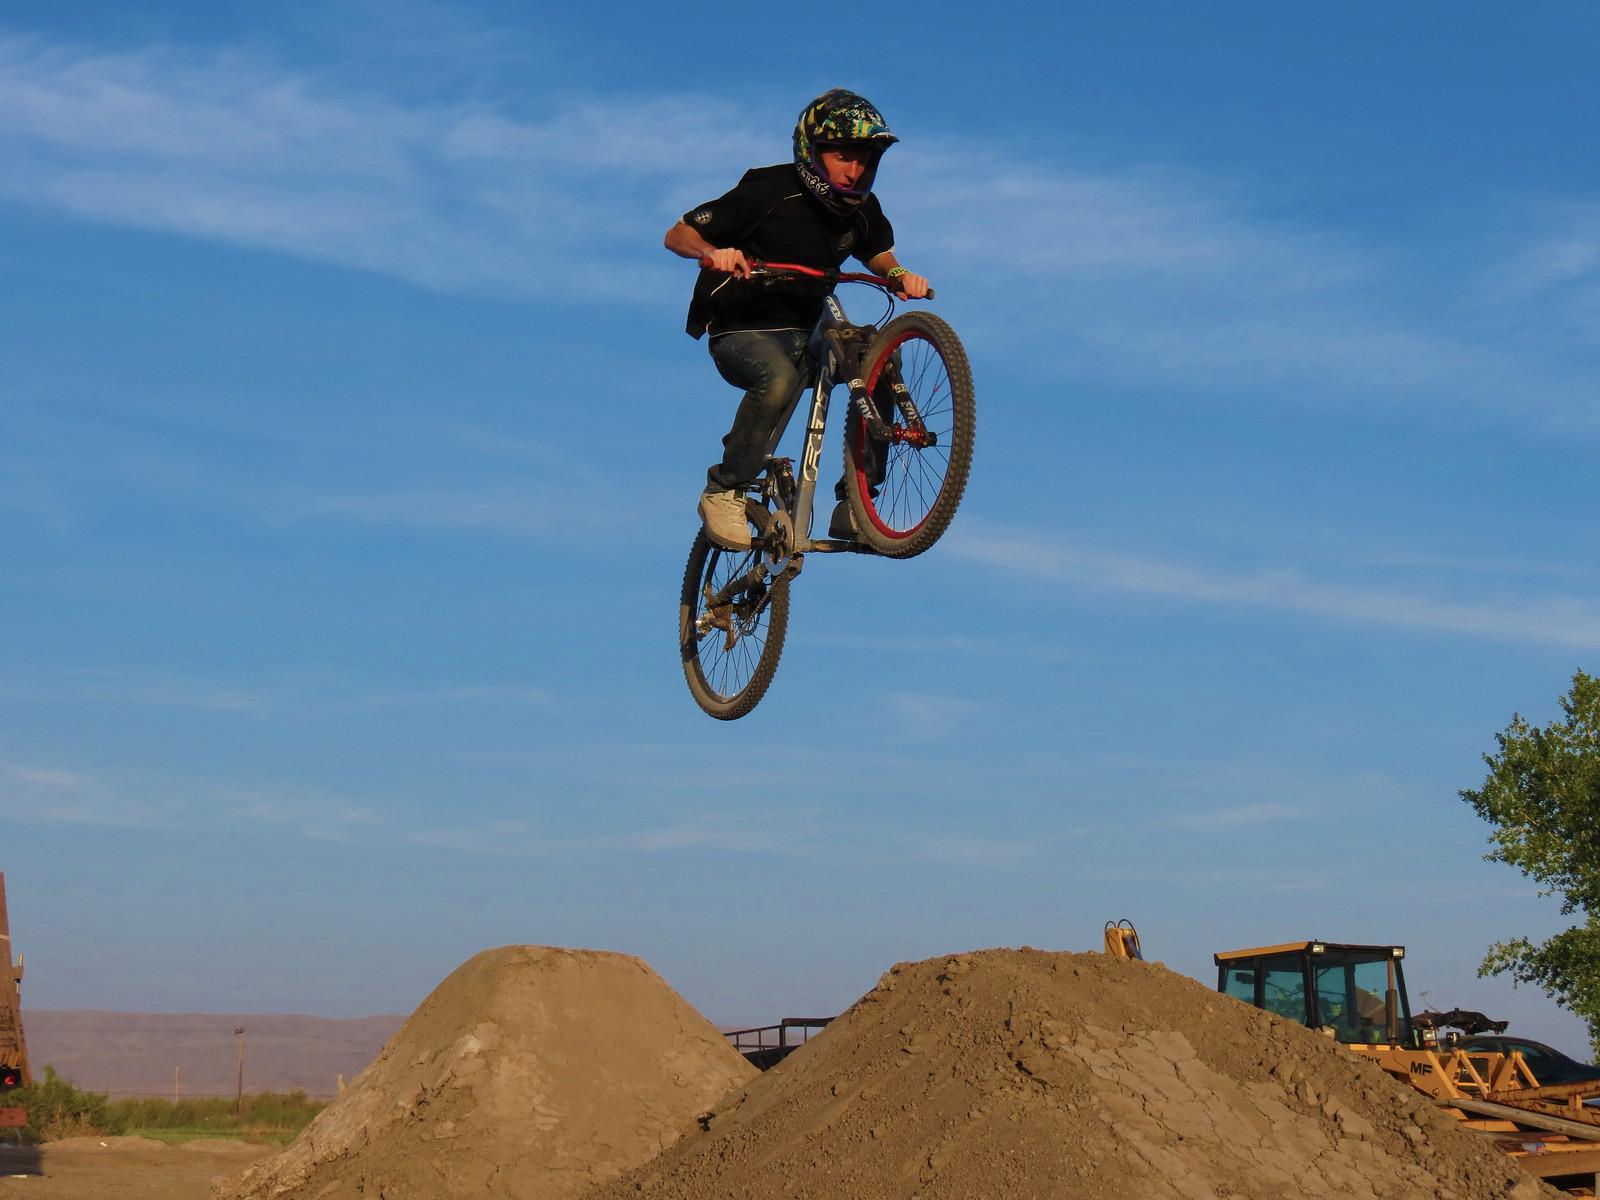 day 4 003 - Moosey - Mountain Biking Pictures - Vital MTB